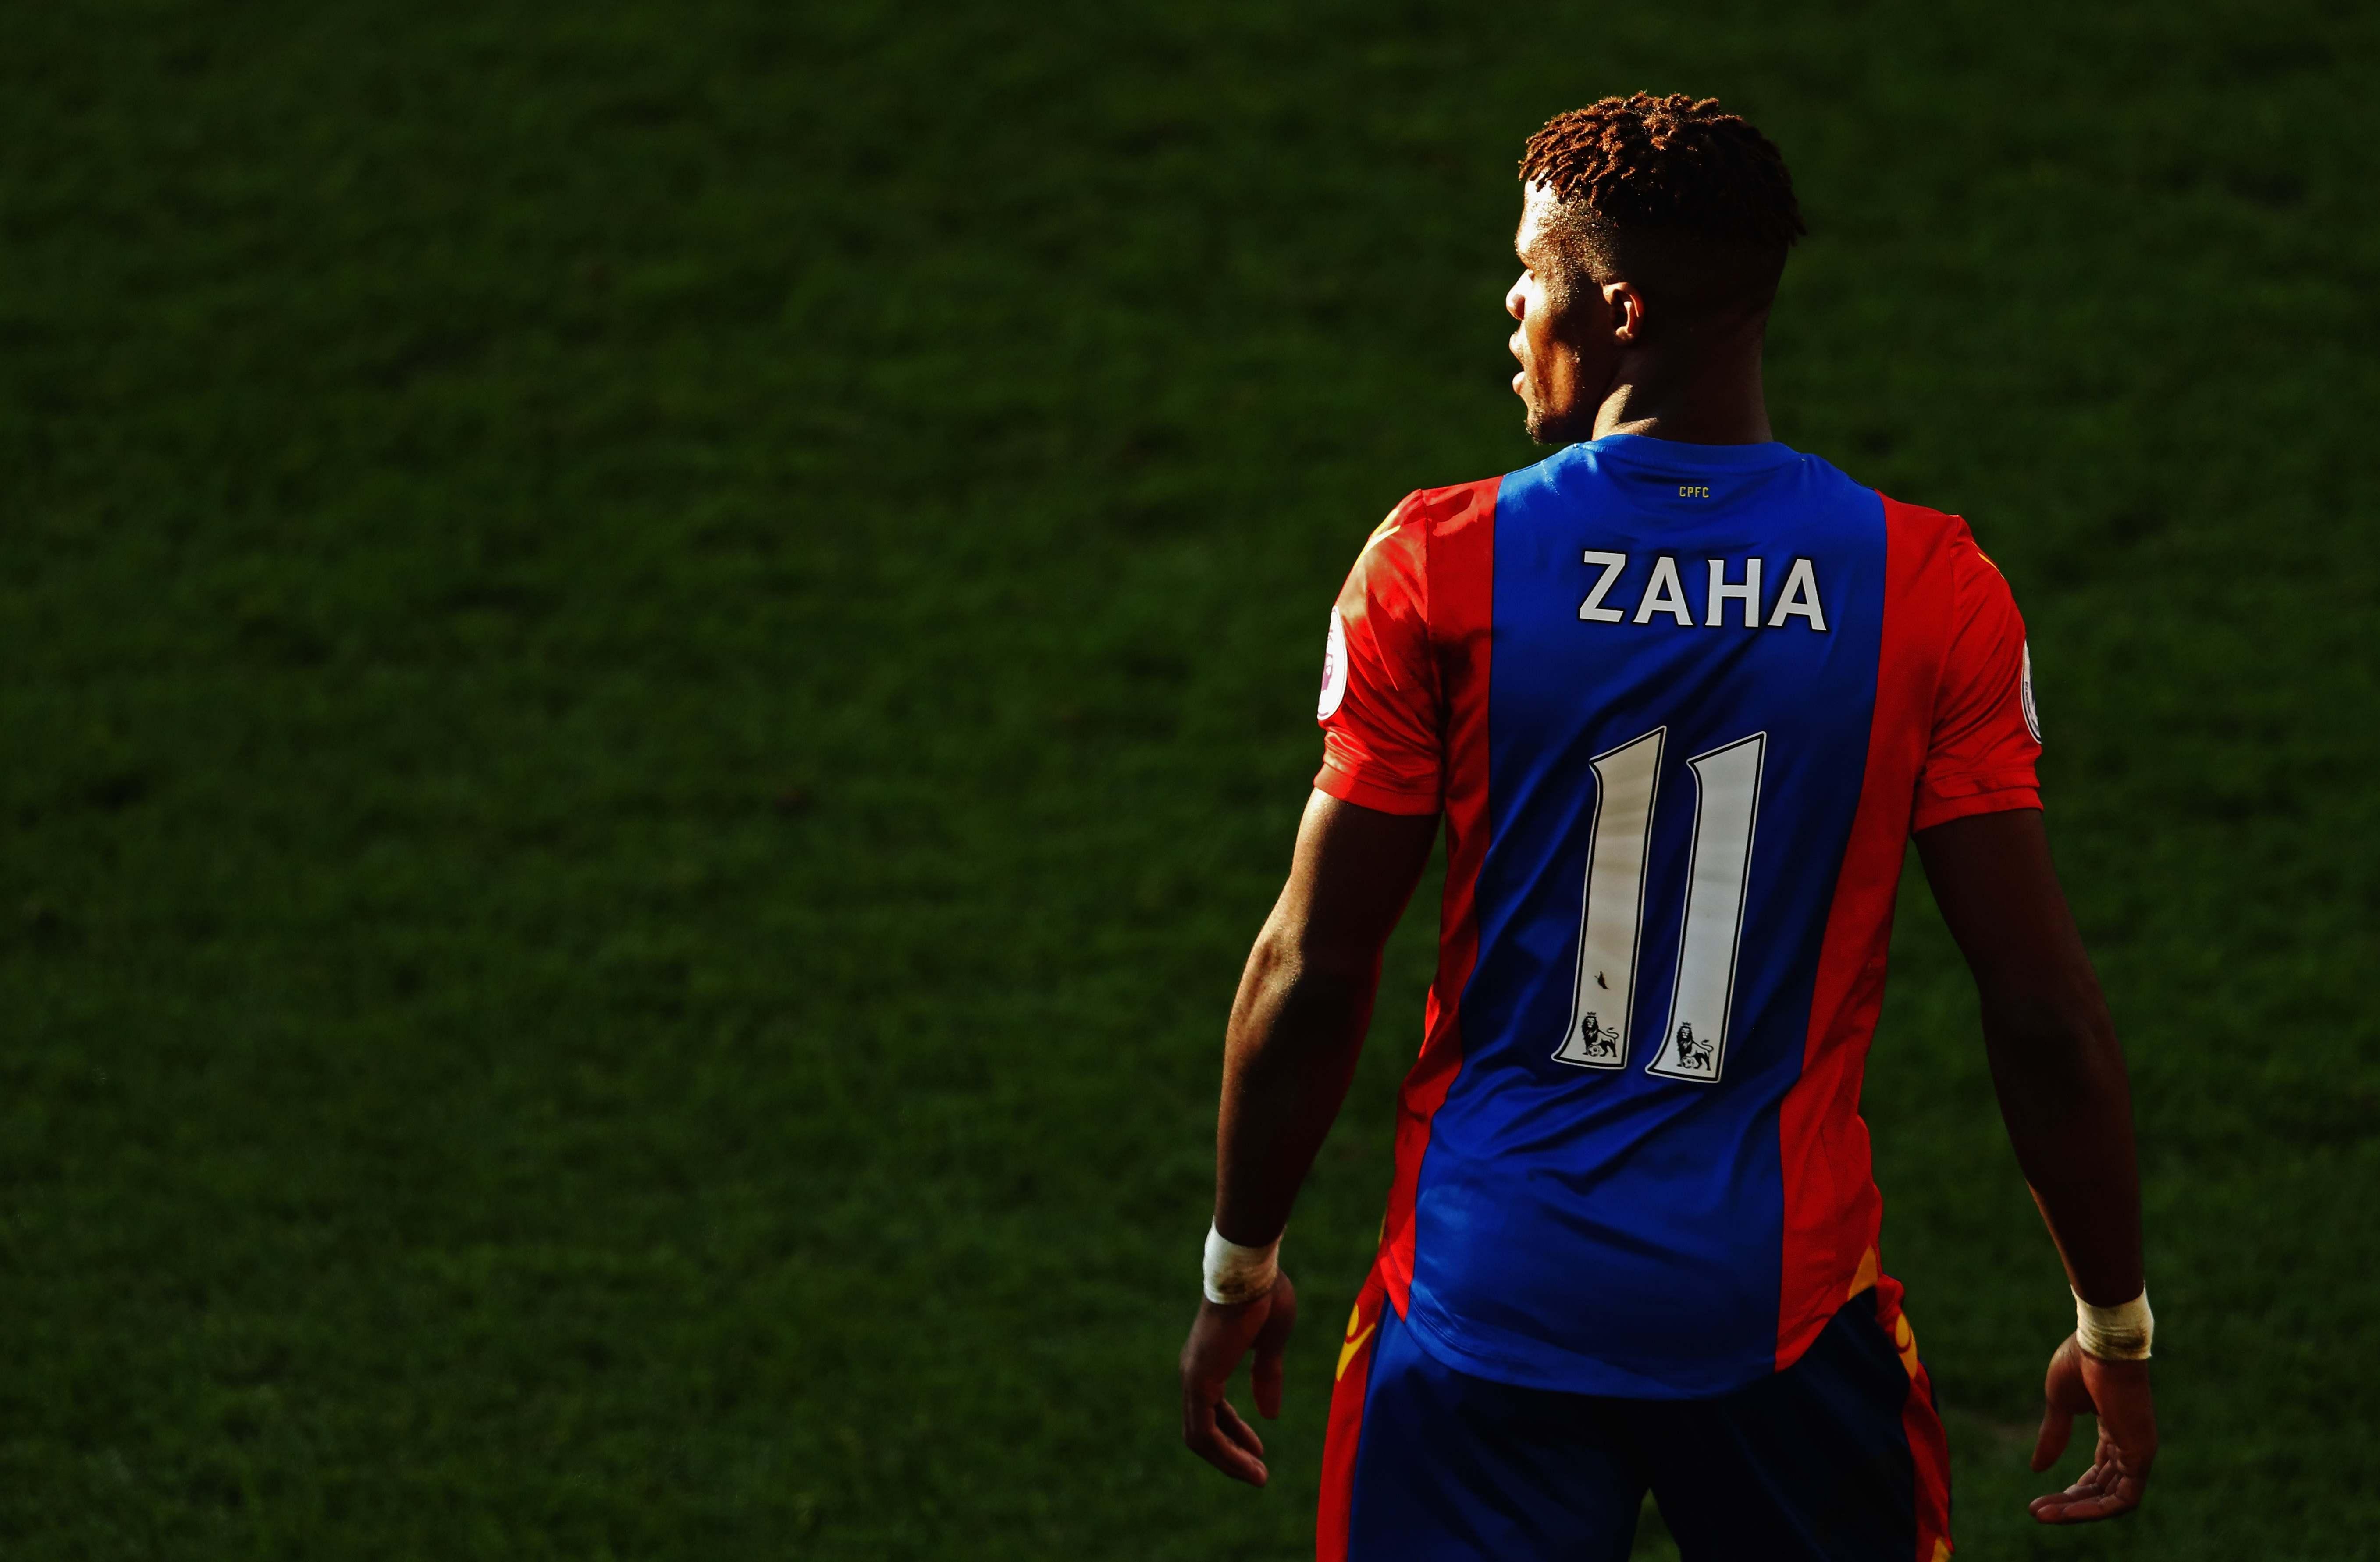 Transfertid: Bundesliga-duks lurer på Zaha